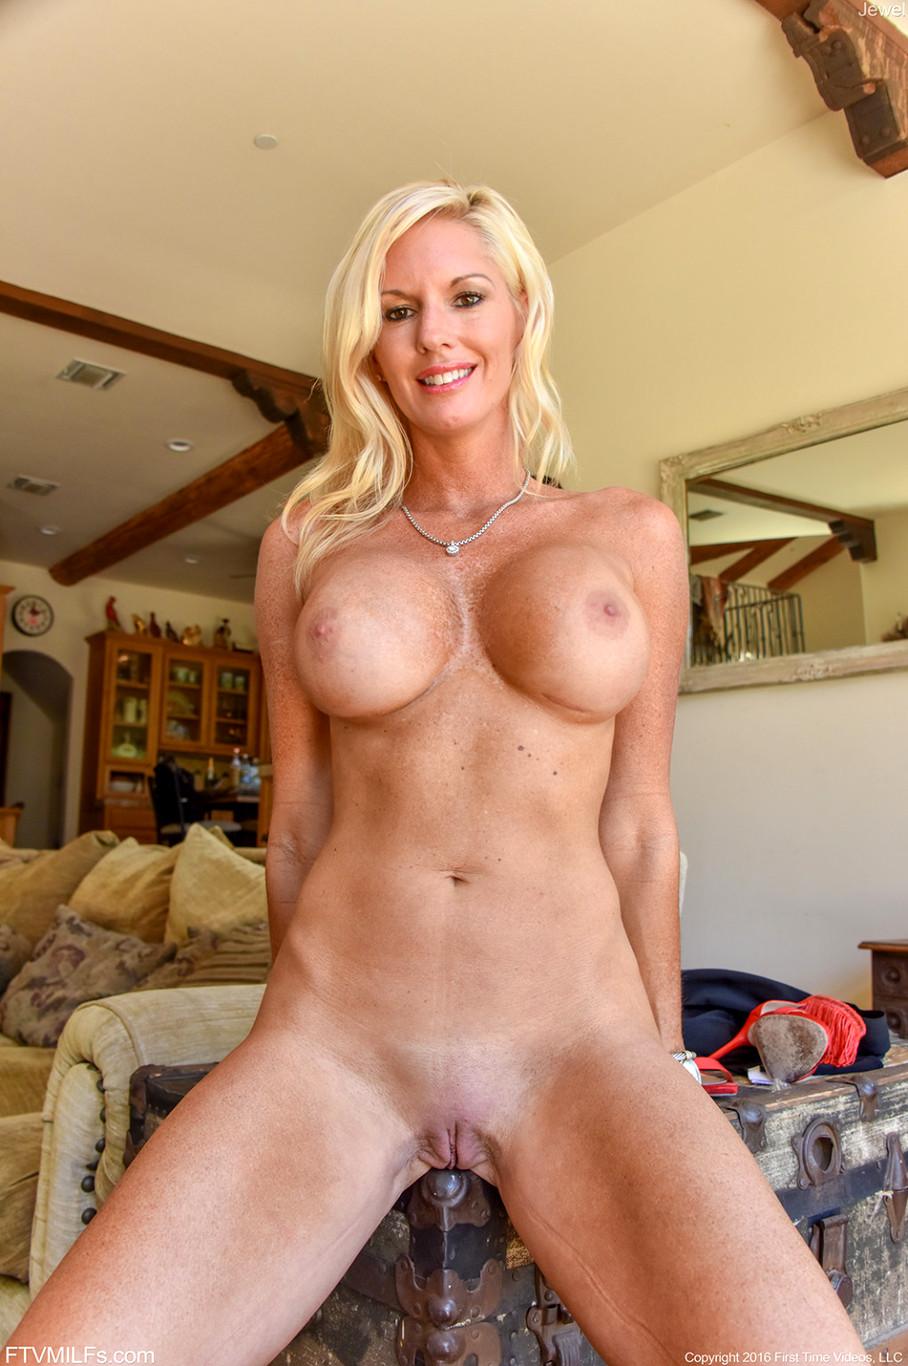 Video tits cougars, wild sexy bikini